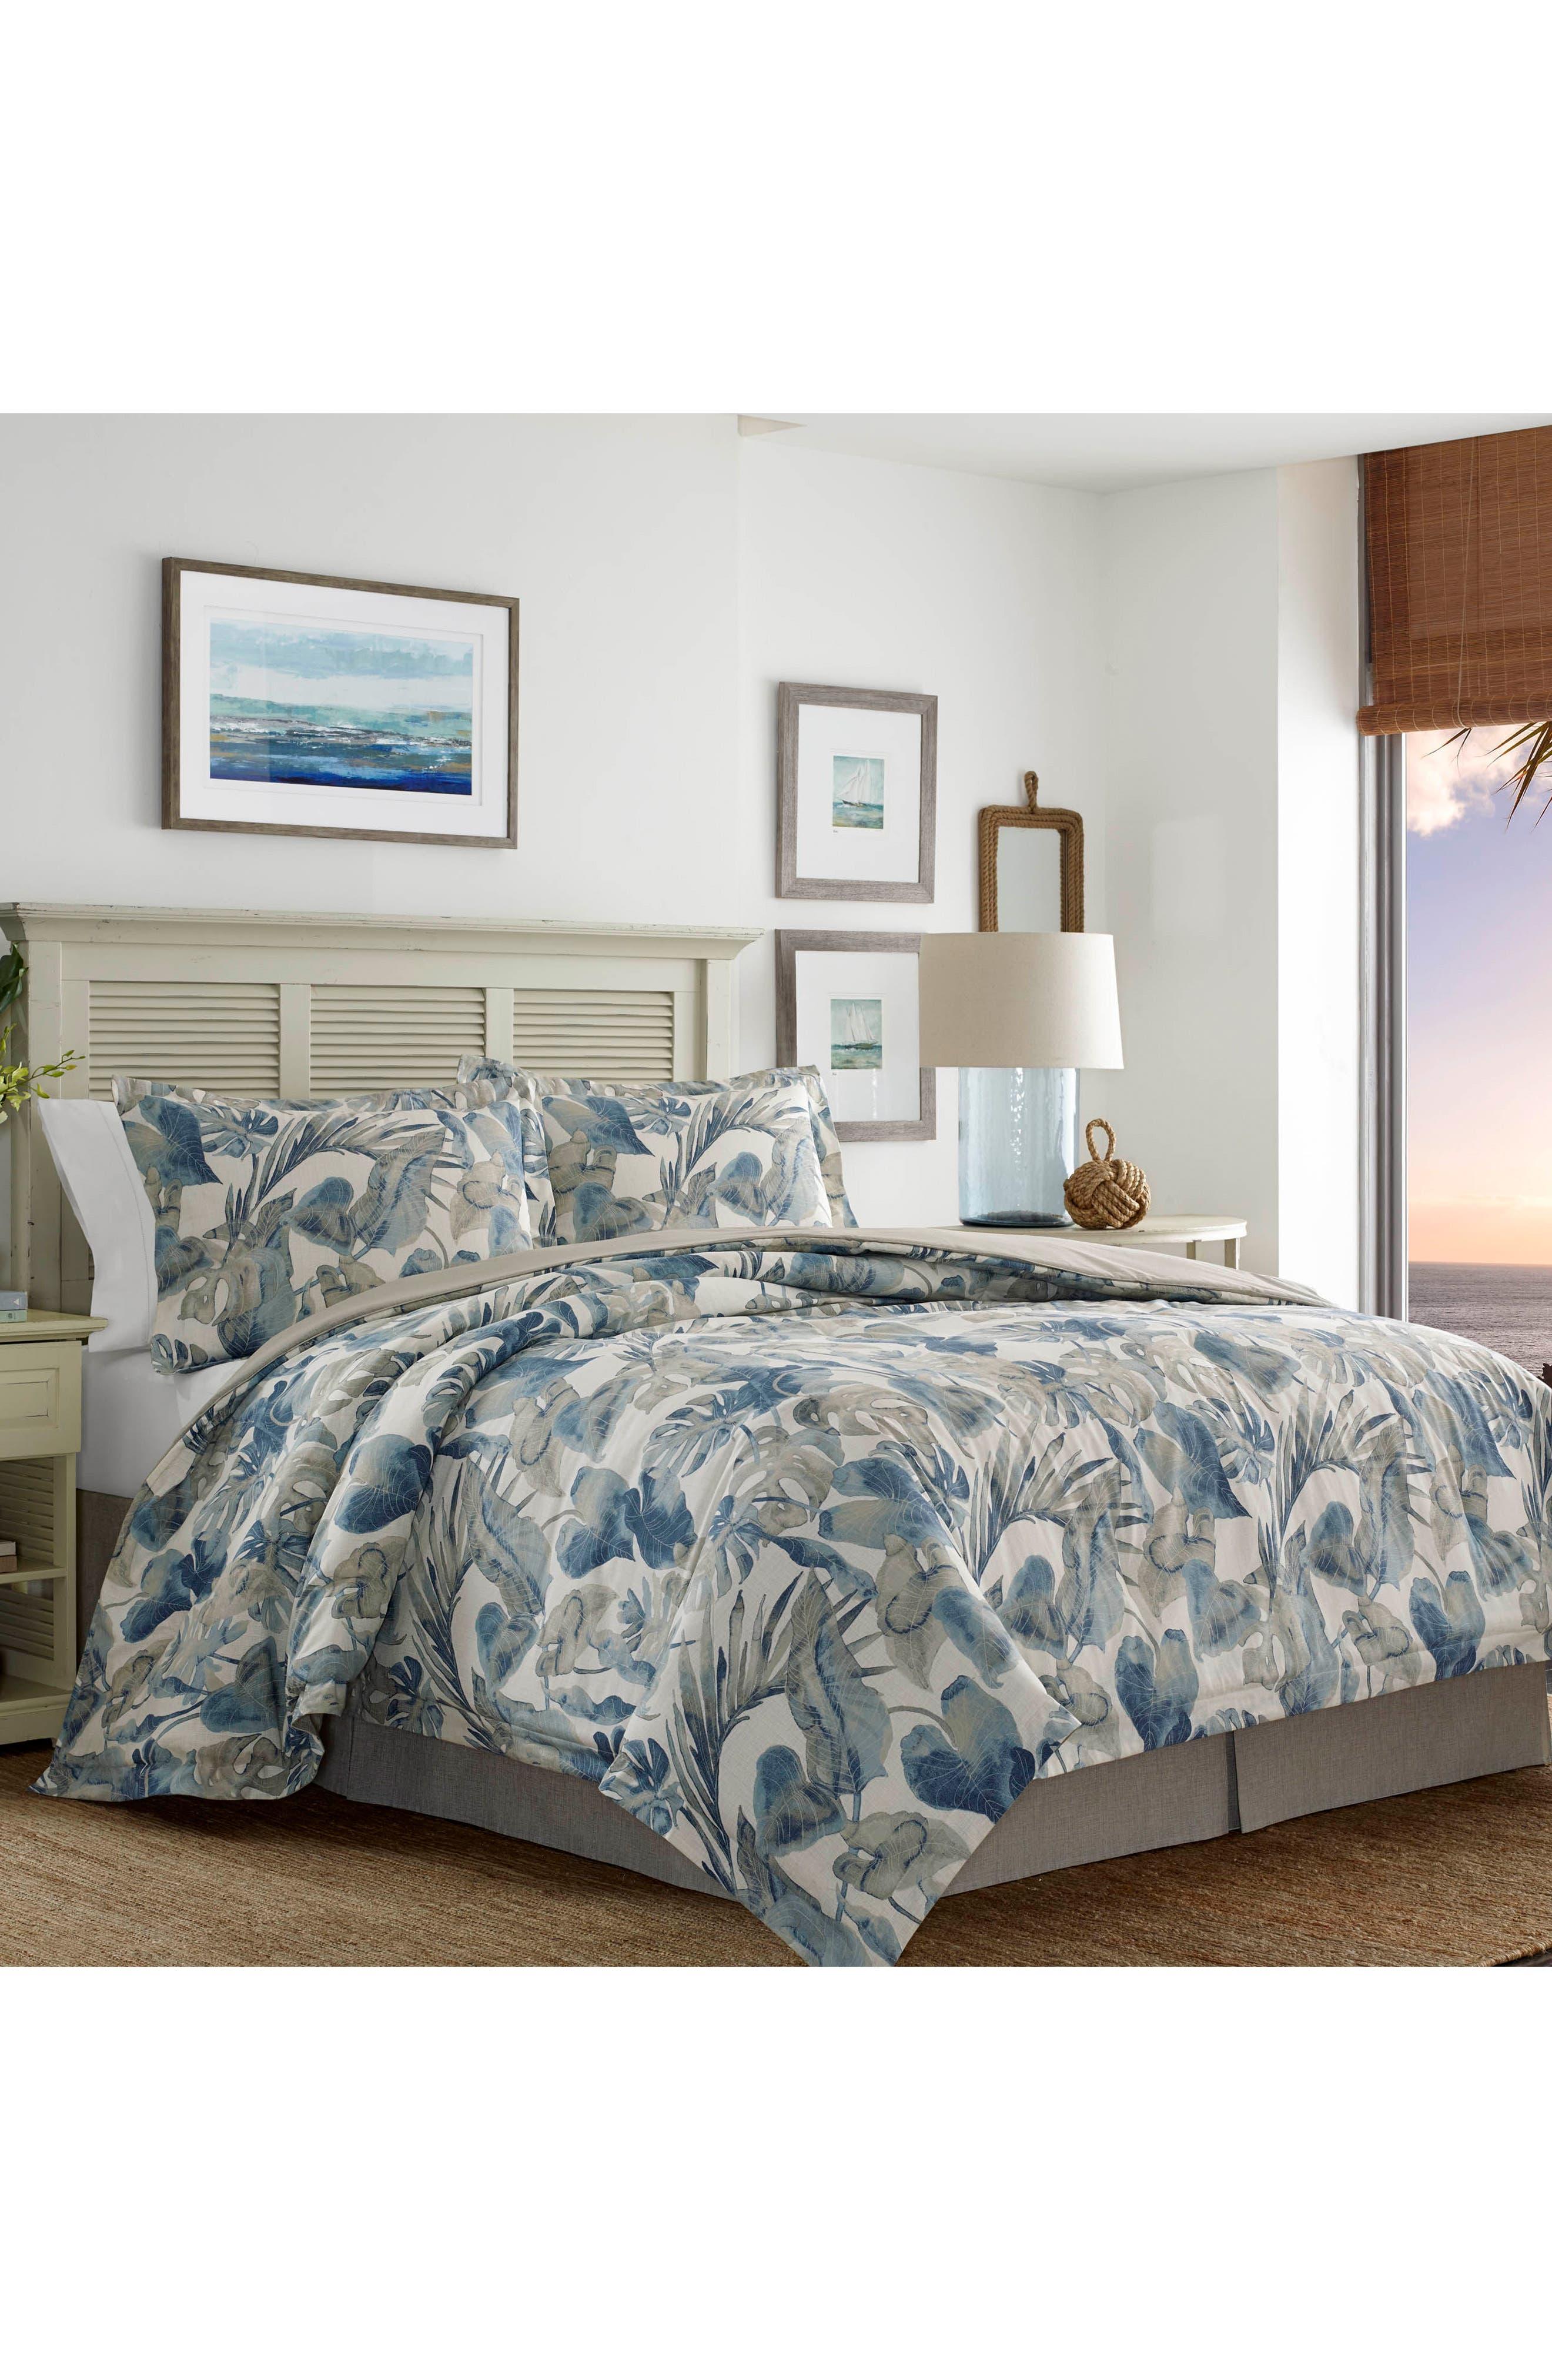 TOMMY BAHAMA,                             Raw Coast Comforter, Sham & Bed Skirt Set,                             Alternate thumbnail 3, color,                             400